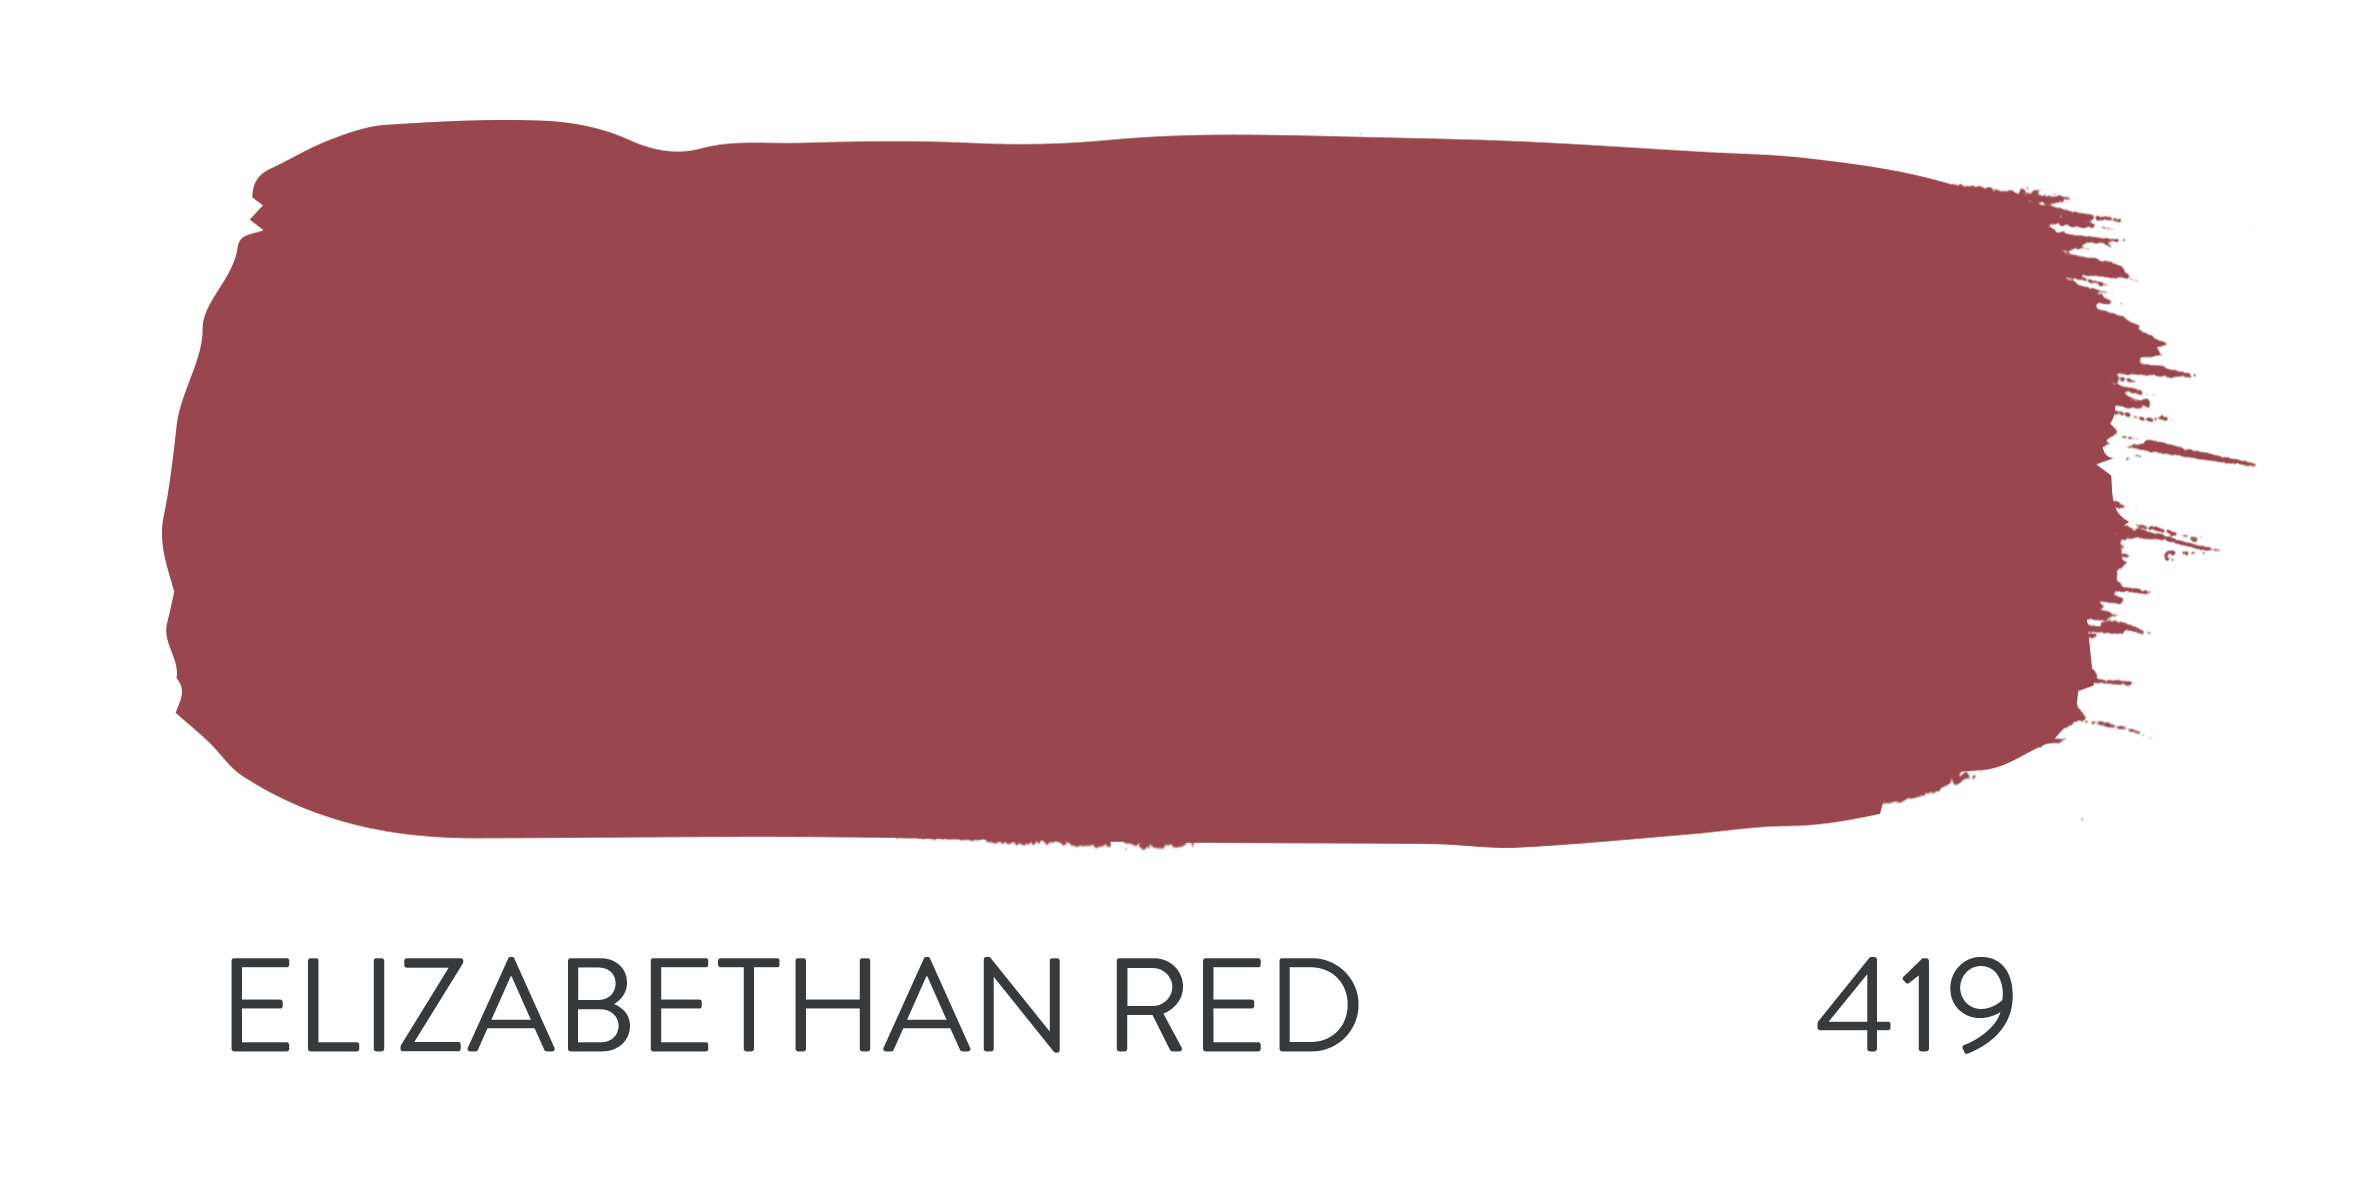 ELIZABETHAN RED 419.jpg